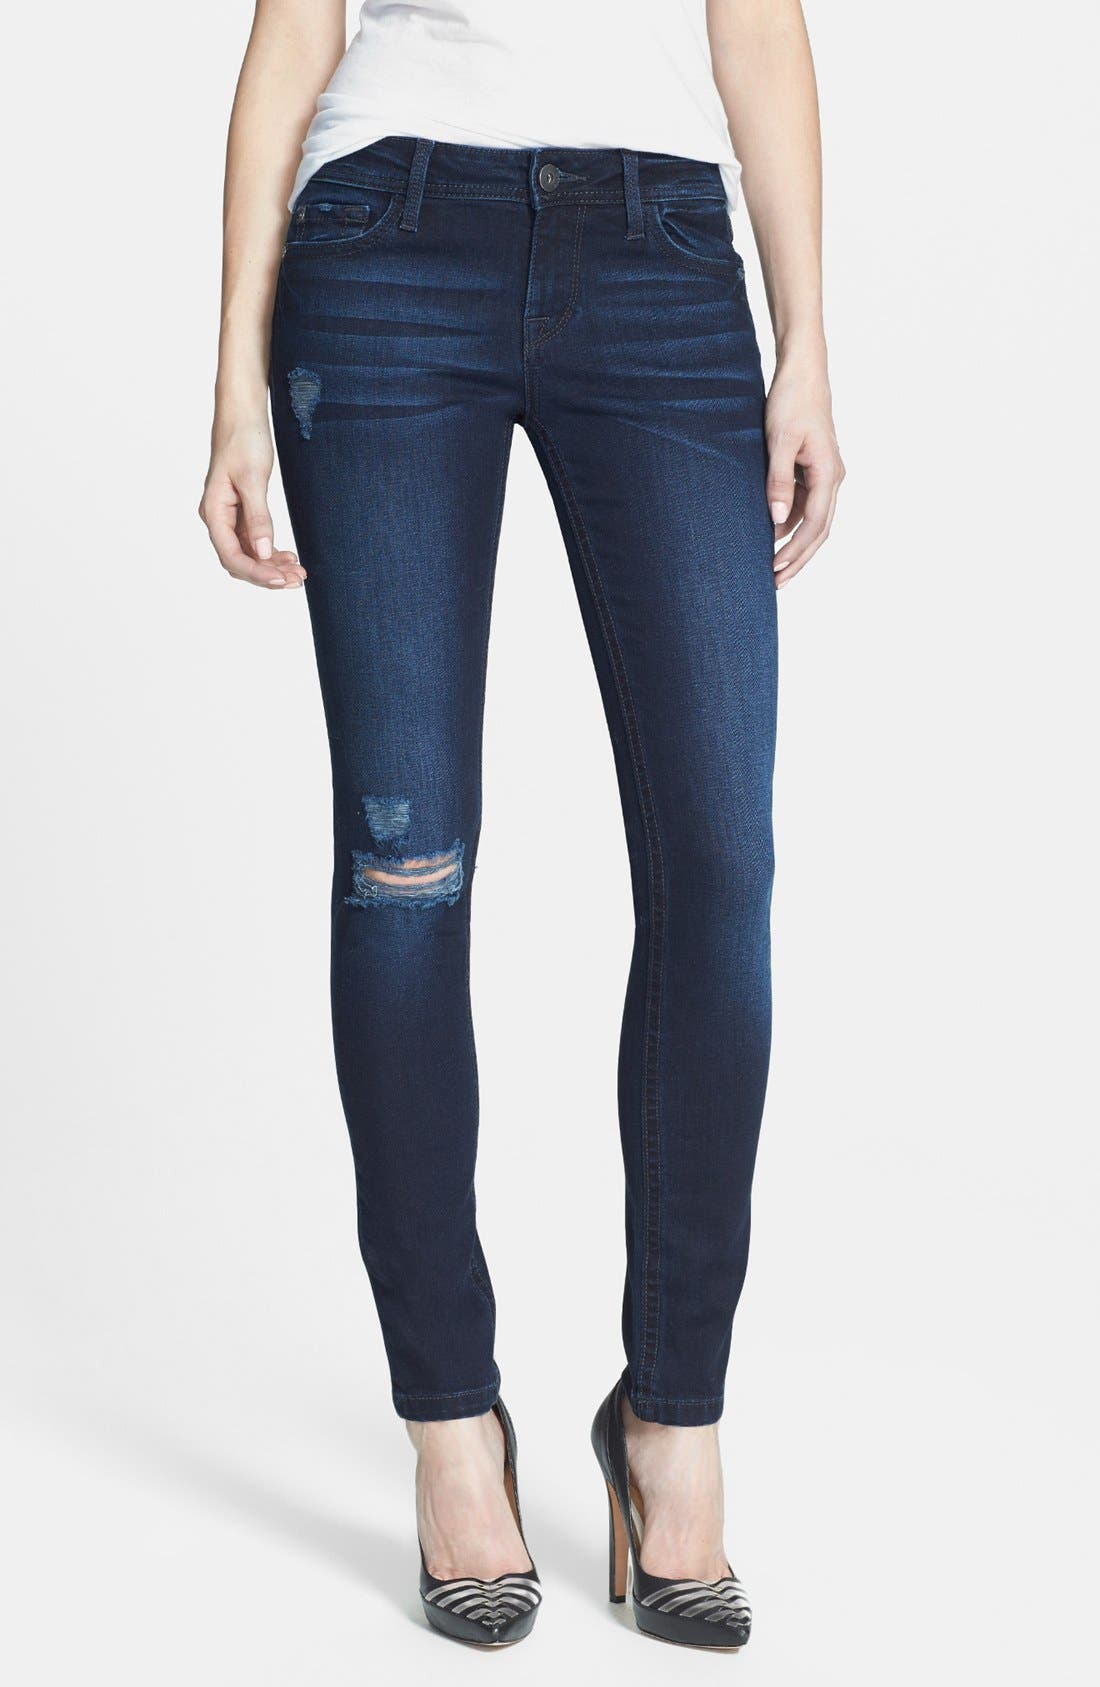 Main Image - DL1961 'Amanda' Distressed Skinny Jeans (Seville)